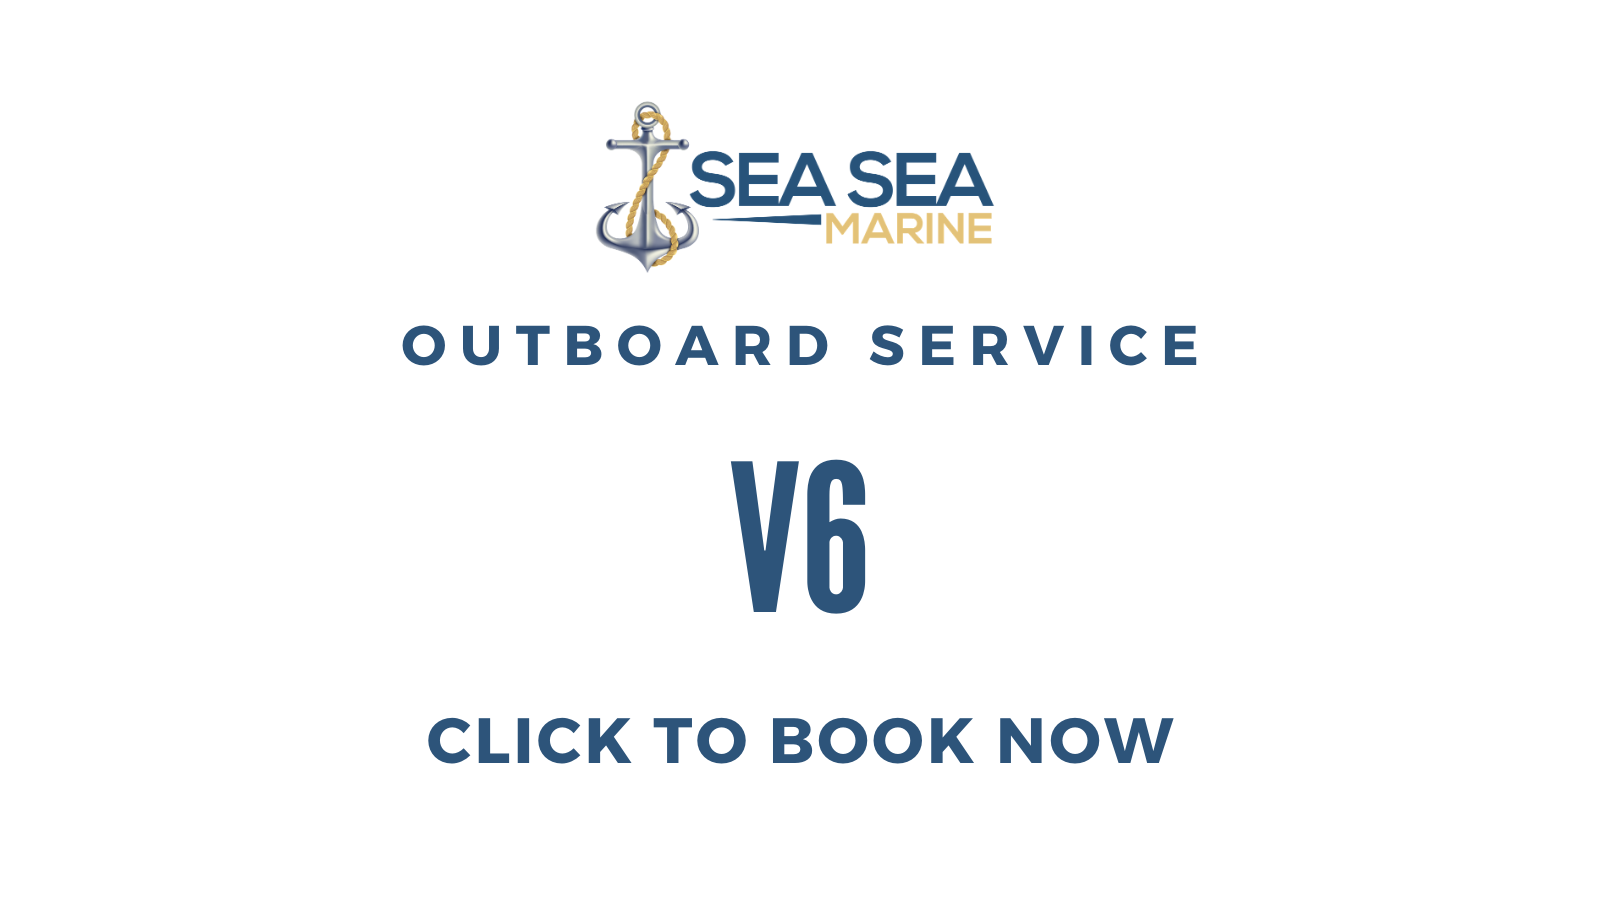 Outboard Service (V6)